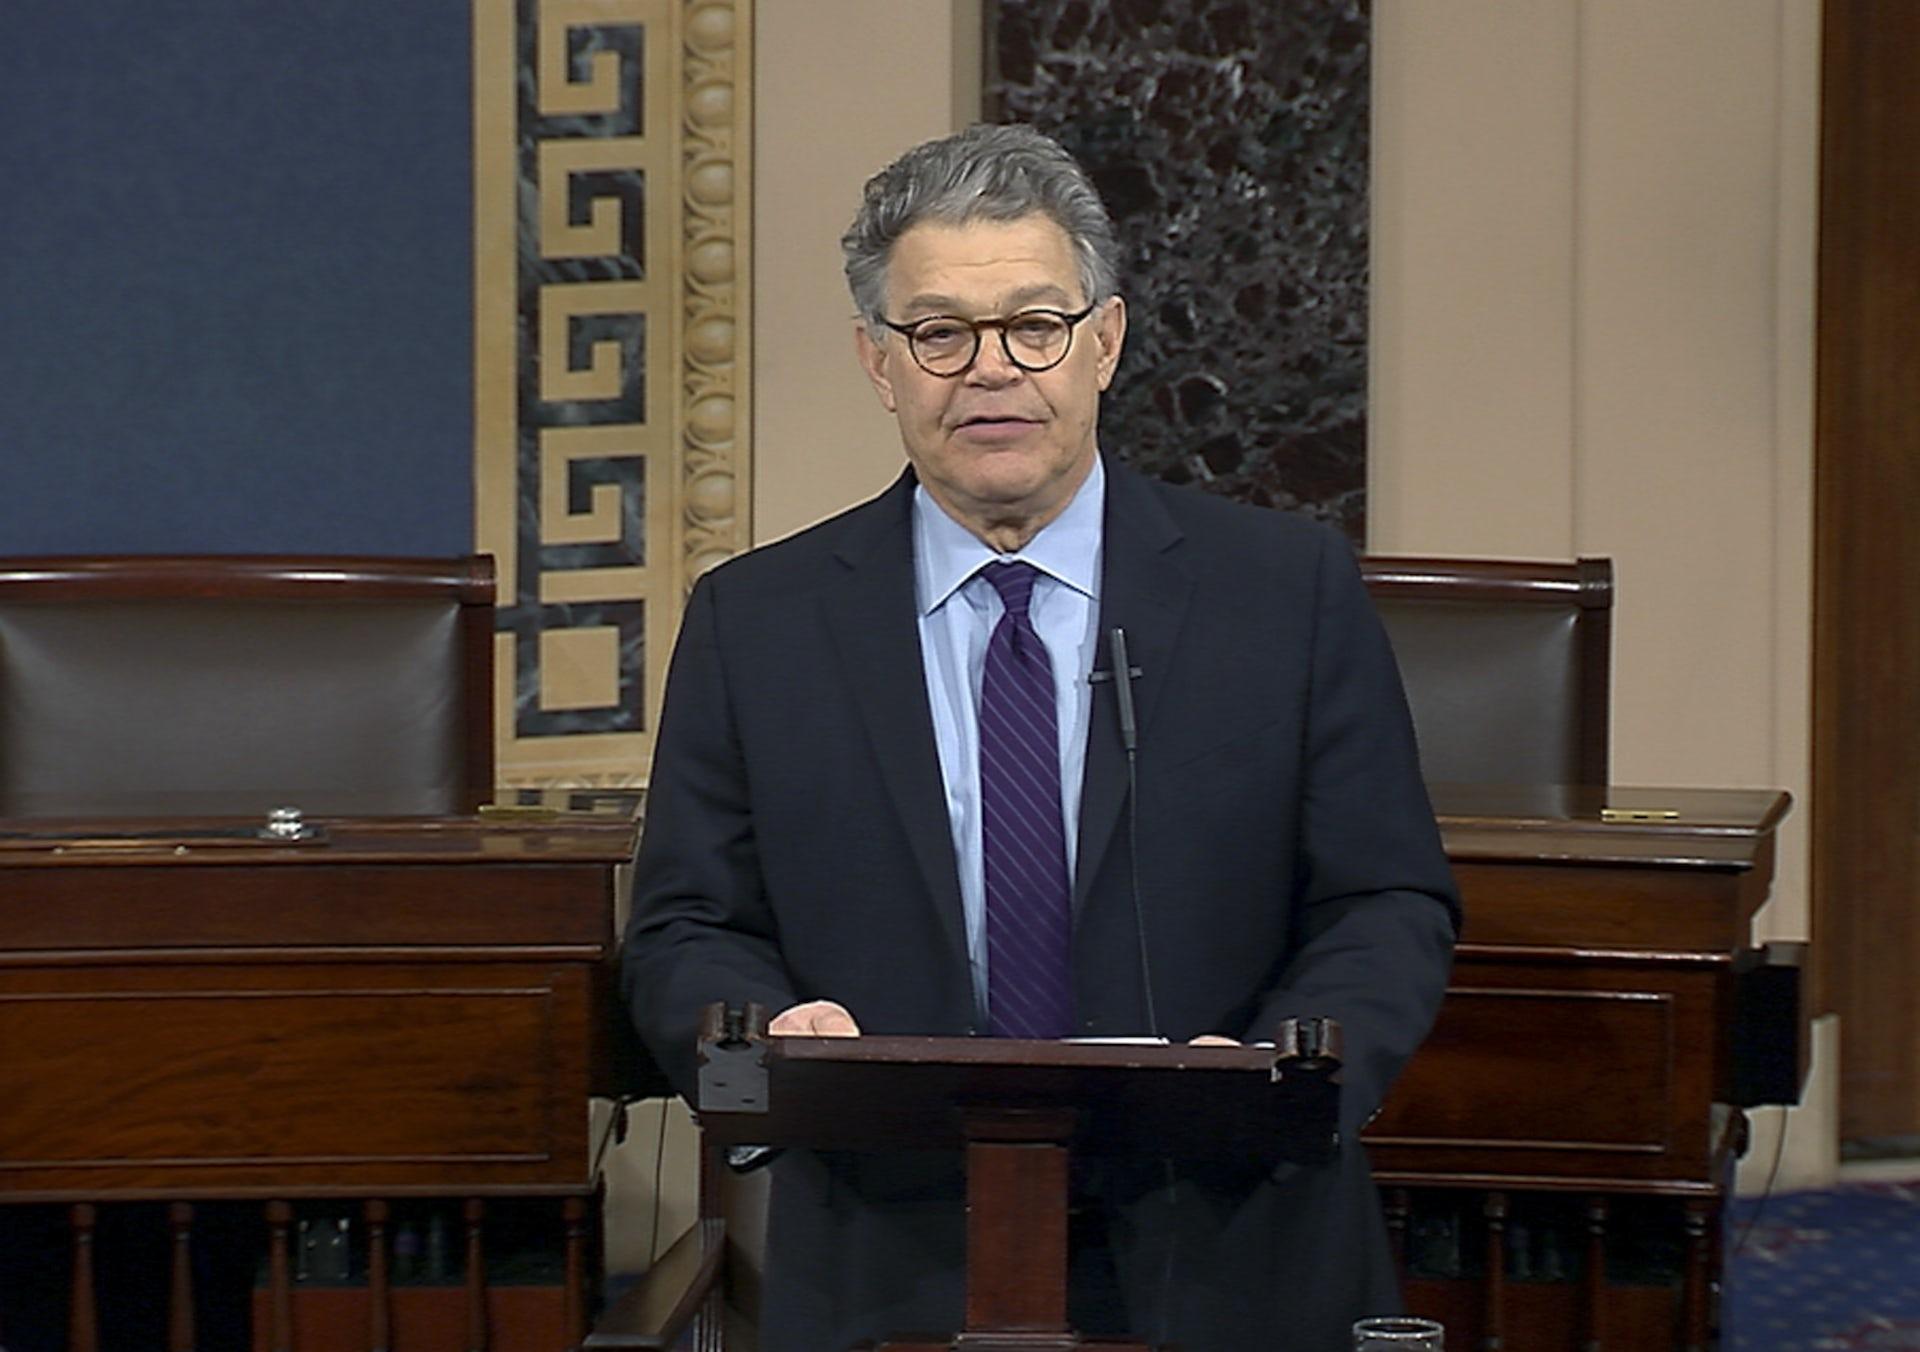 Do the resignations of Senators Al Franken and John Conyers really give Democrats the moral high ground? Senate TV via AP